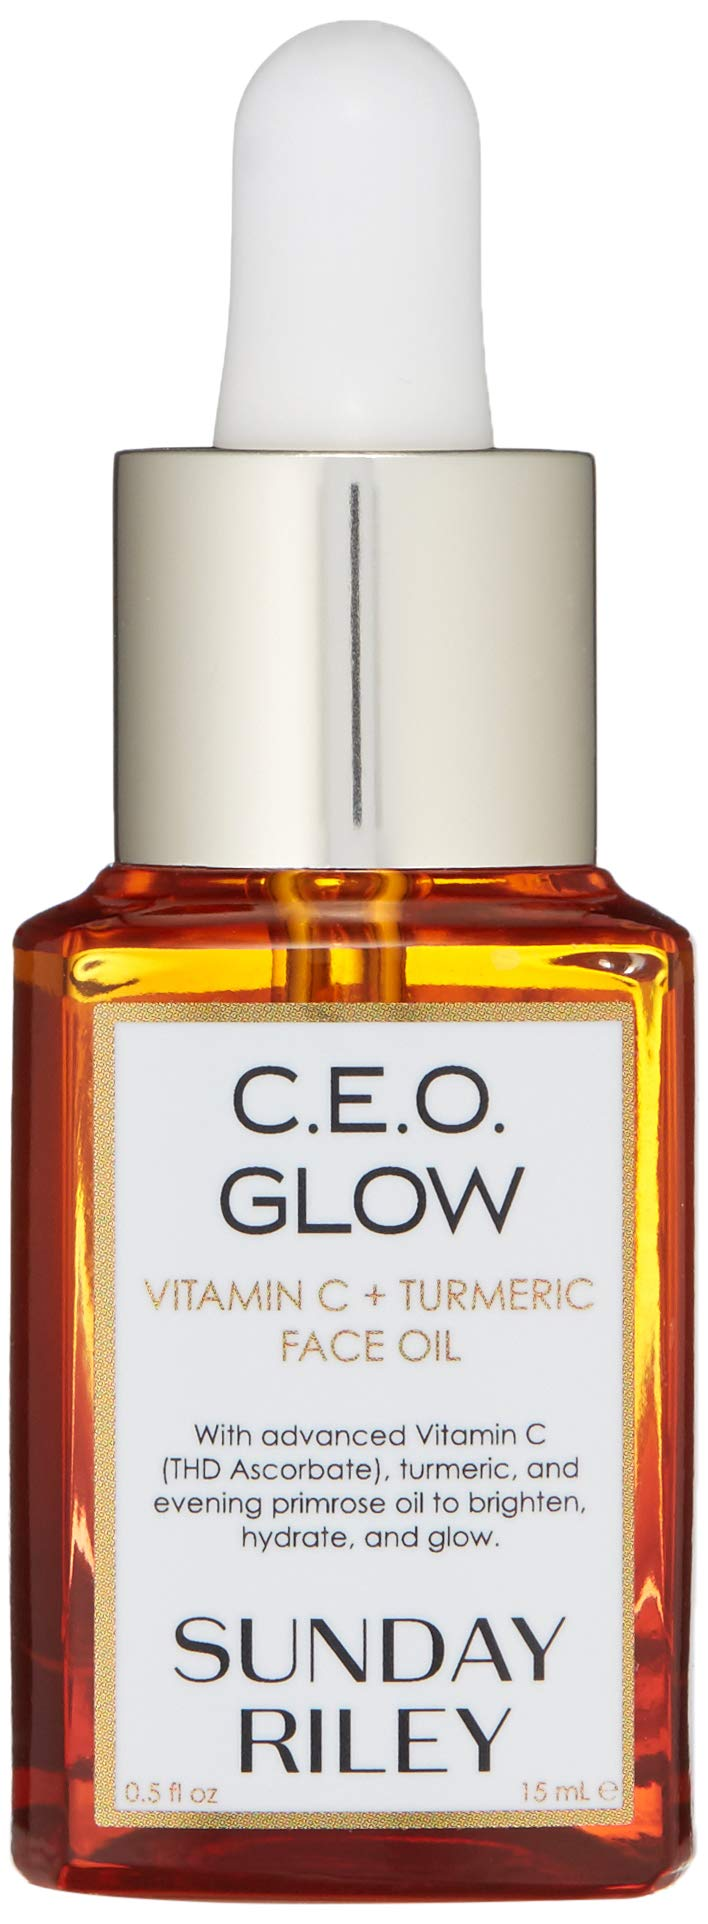 Sunday Riley C.E.O. Glow Vitamin C + Turmeric Face Oil, 0.5 fl. oz. by Sunday Riley